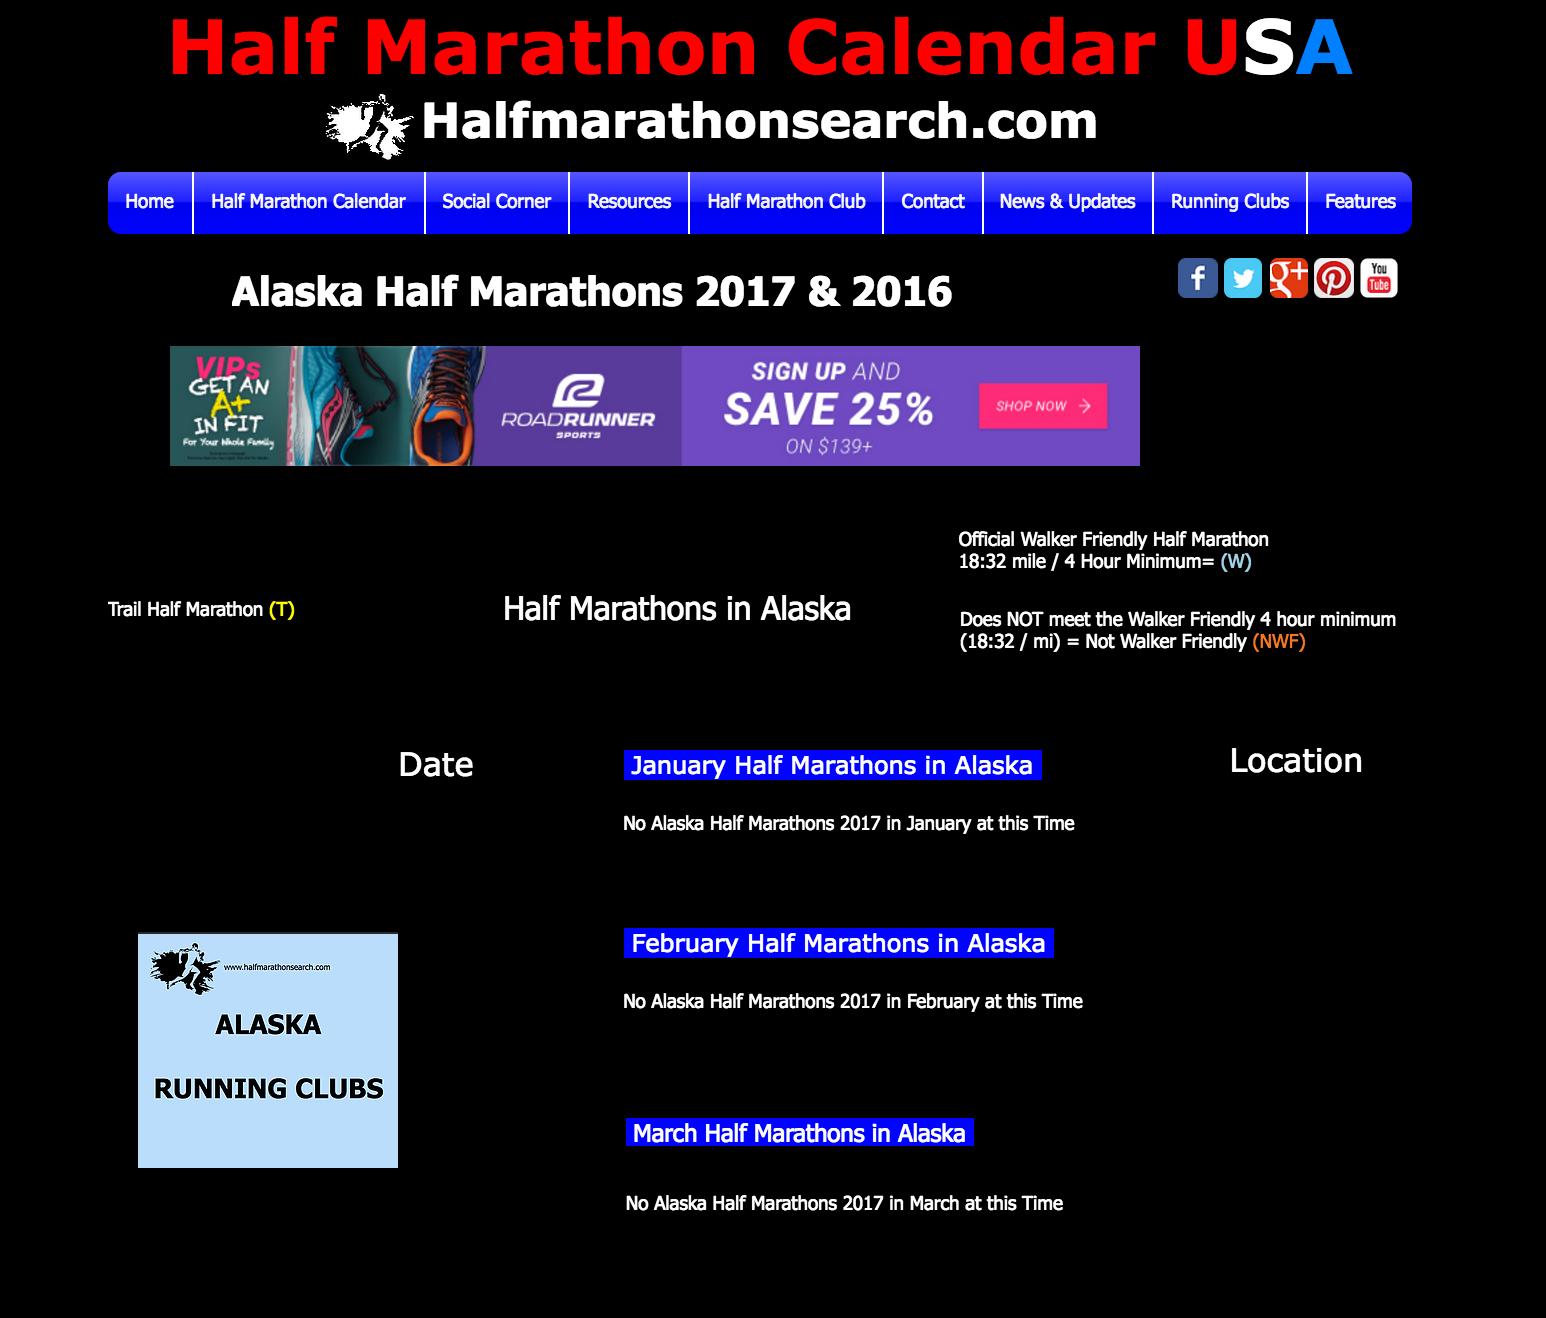 Search For Alaska Half Marathons Alaska Half Marathon Calendar Usa Half Marathon Schedule Http Www Halfmarathonsearc Calendar Usa Half Marathon Marathon